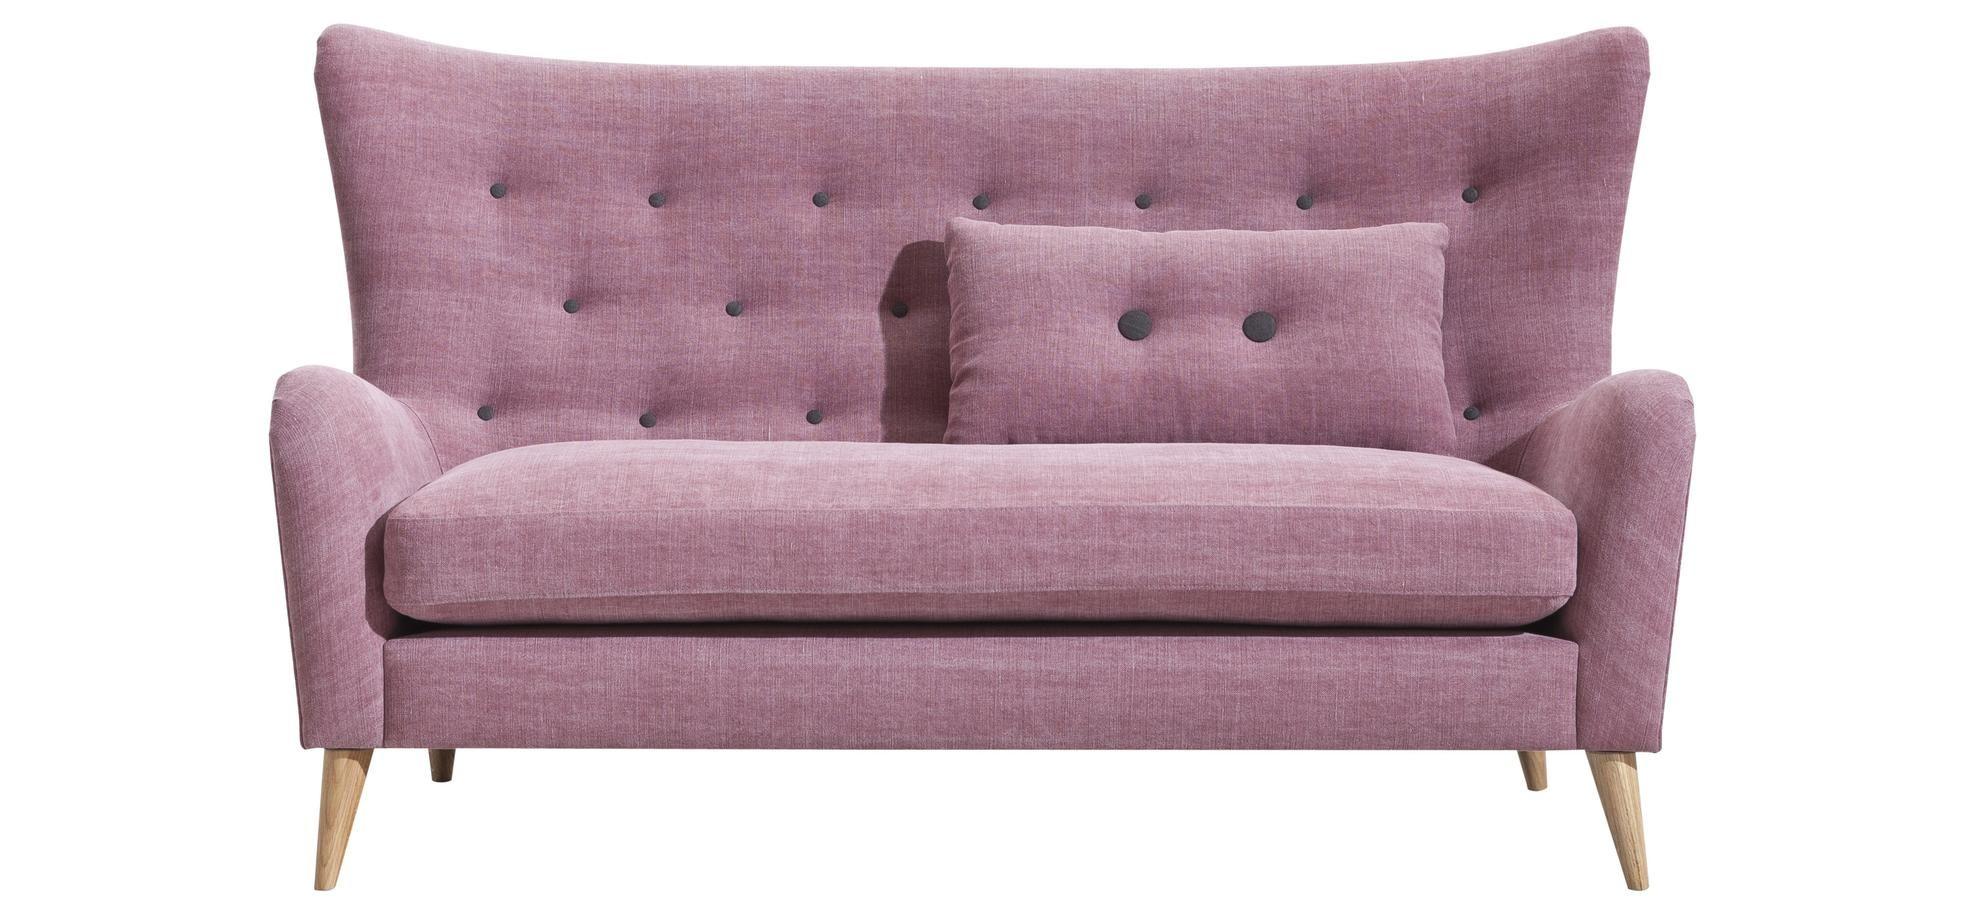 sofa natura 7030 stoffbezug zierkn pfe f e eiche ge lt abmessung ca 171x96x95 cm m bel. Black Bedroom Furniture Sets. Home Design Ideas